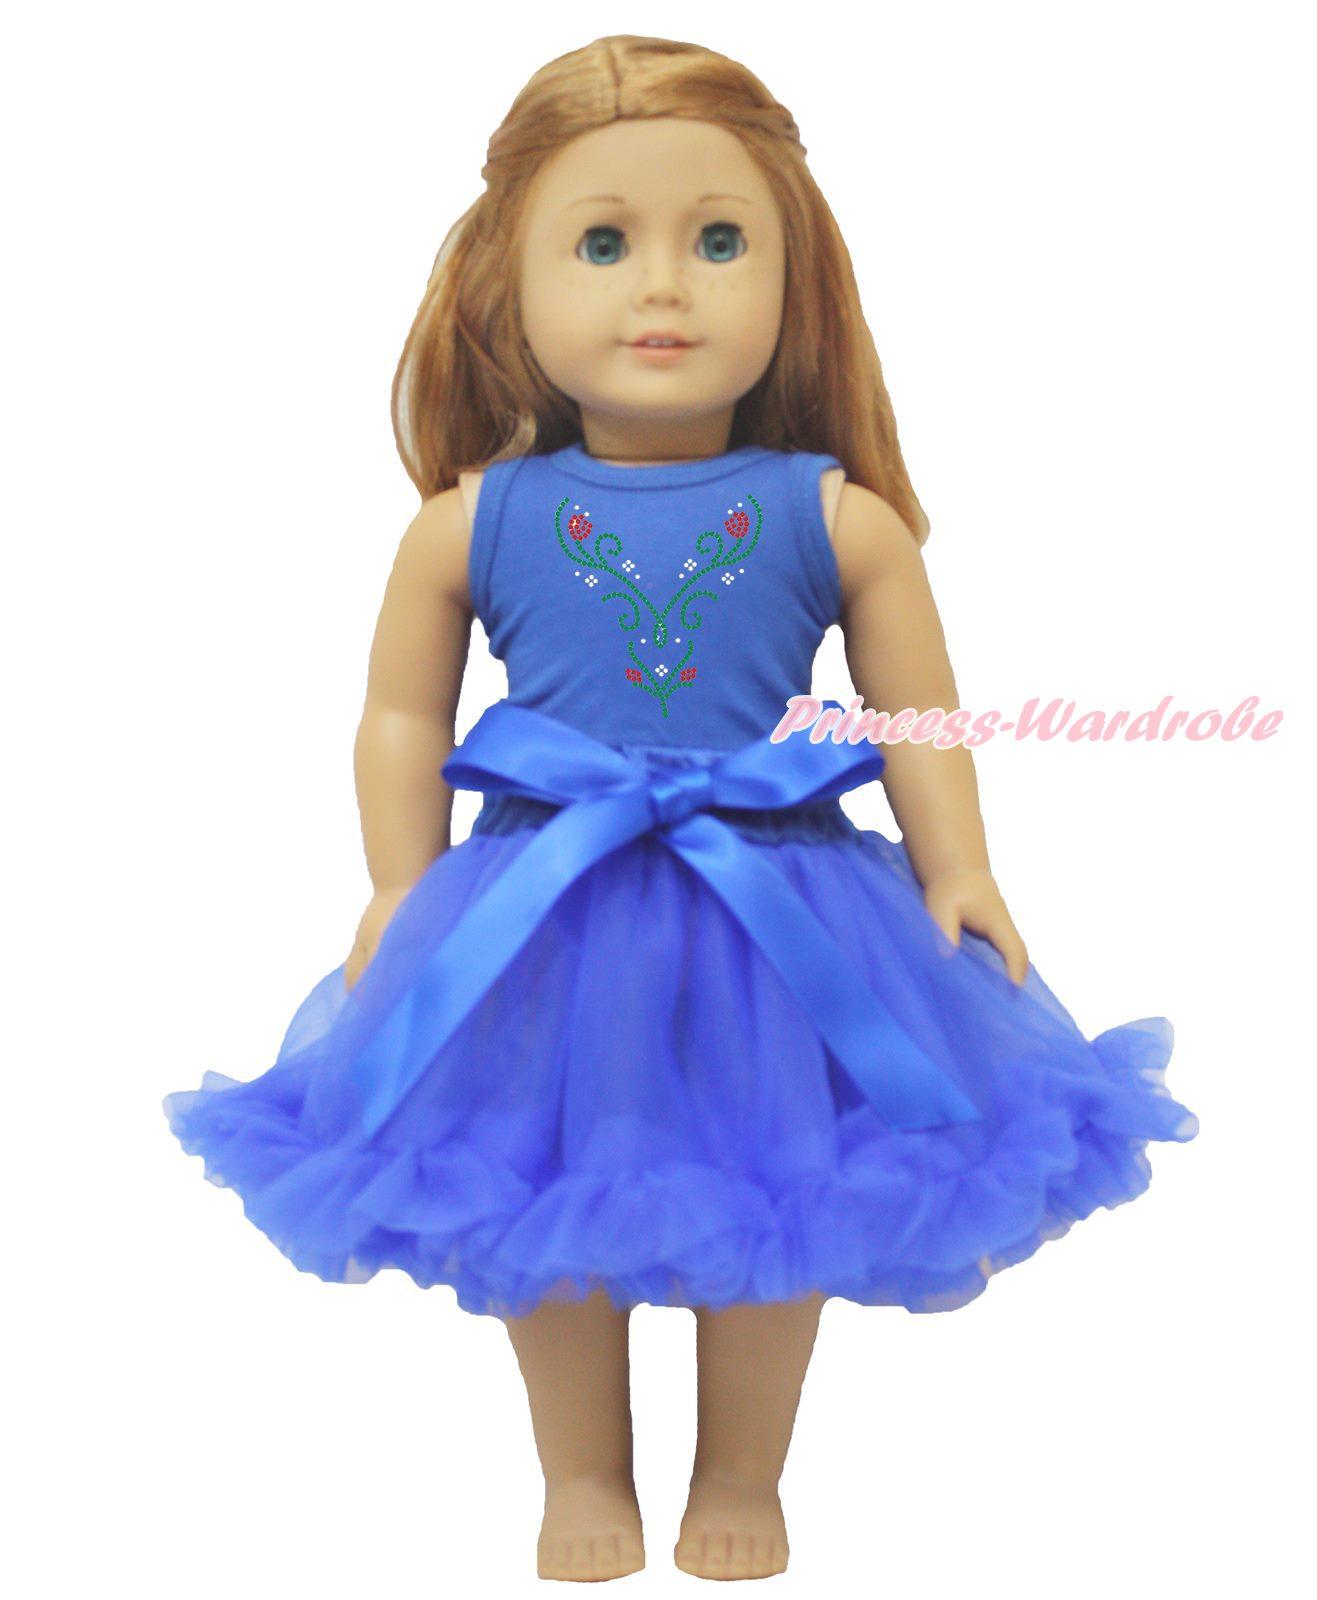 "Rhinestone Princess Print Top Pink Rose Pettiskirt 18/"" American Doll Outfit Set"